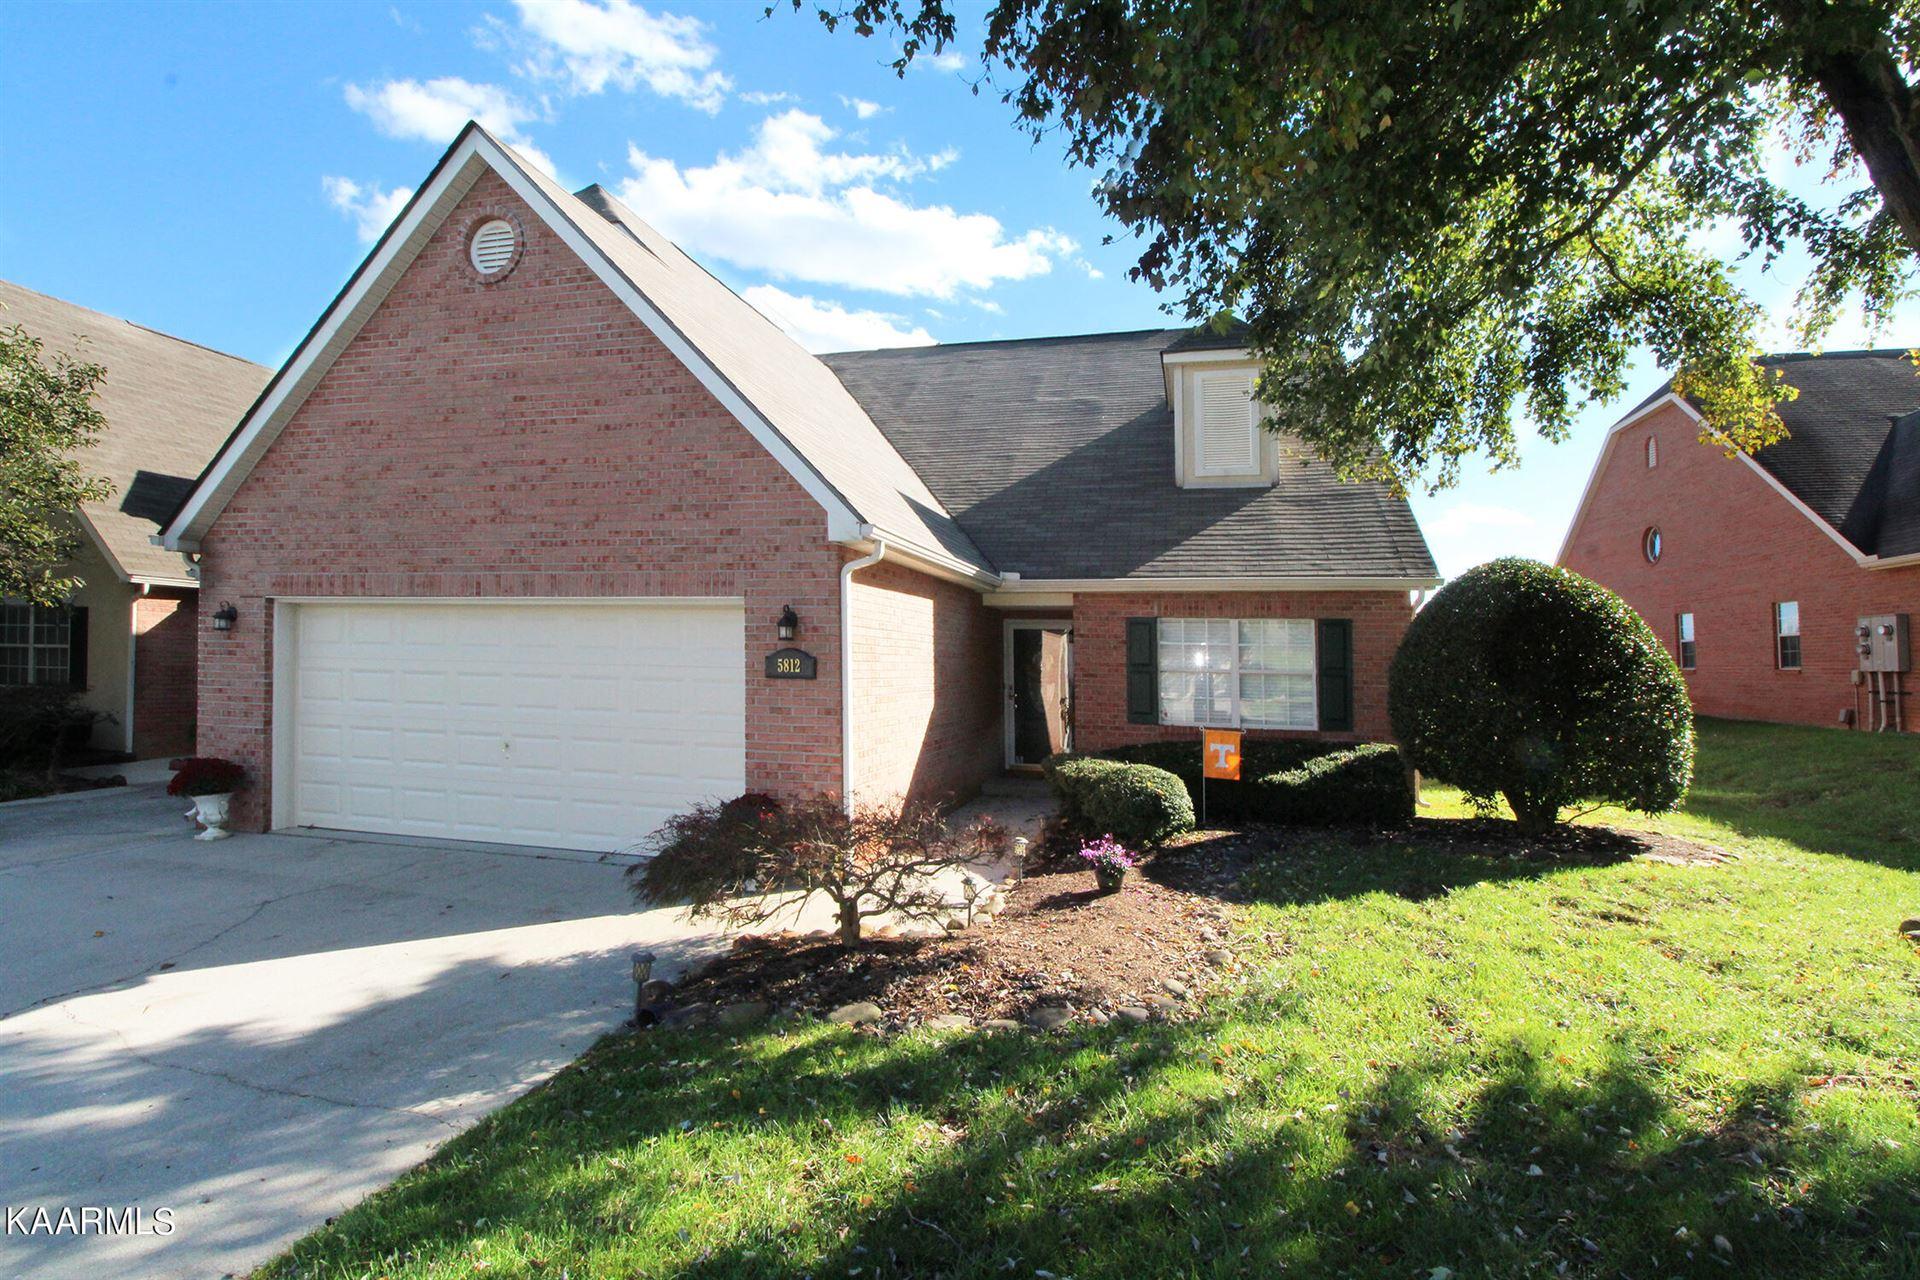 Photo of 5812 Carroll Creek Lane, Knoxville, TN 37912 (MLS # 1170938)